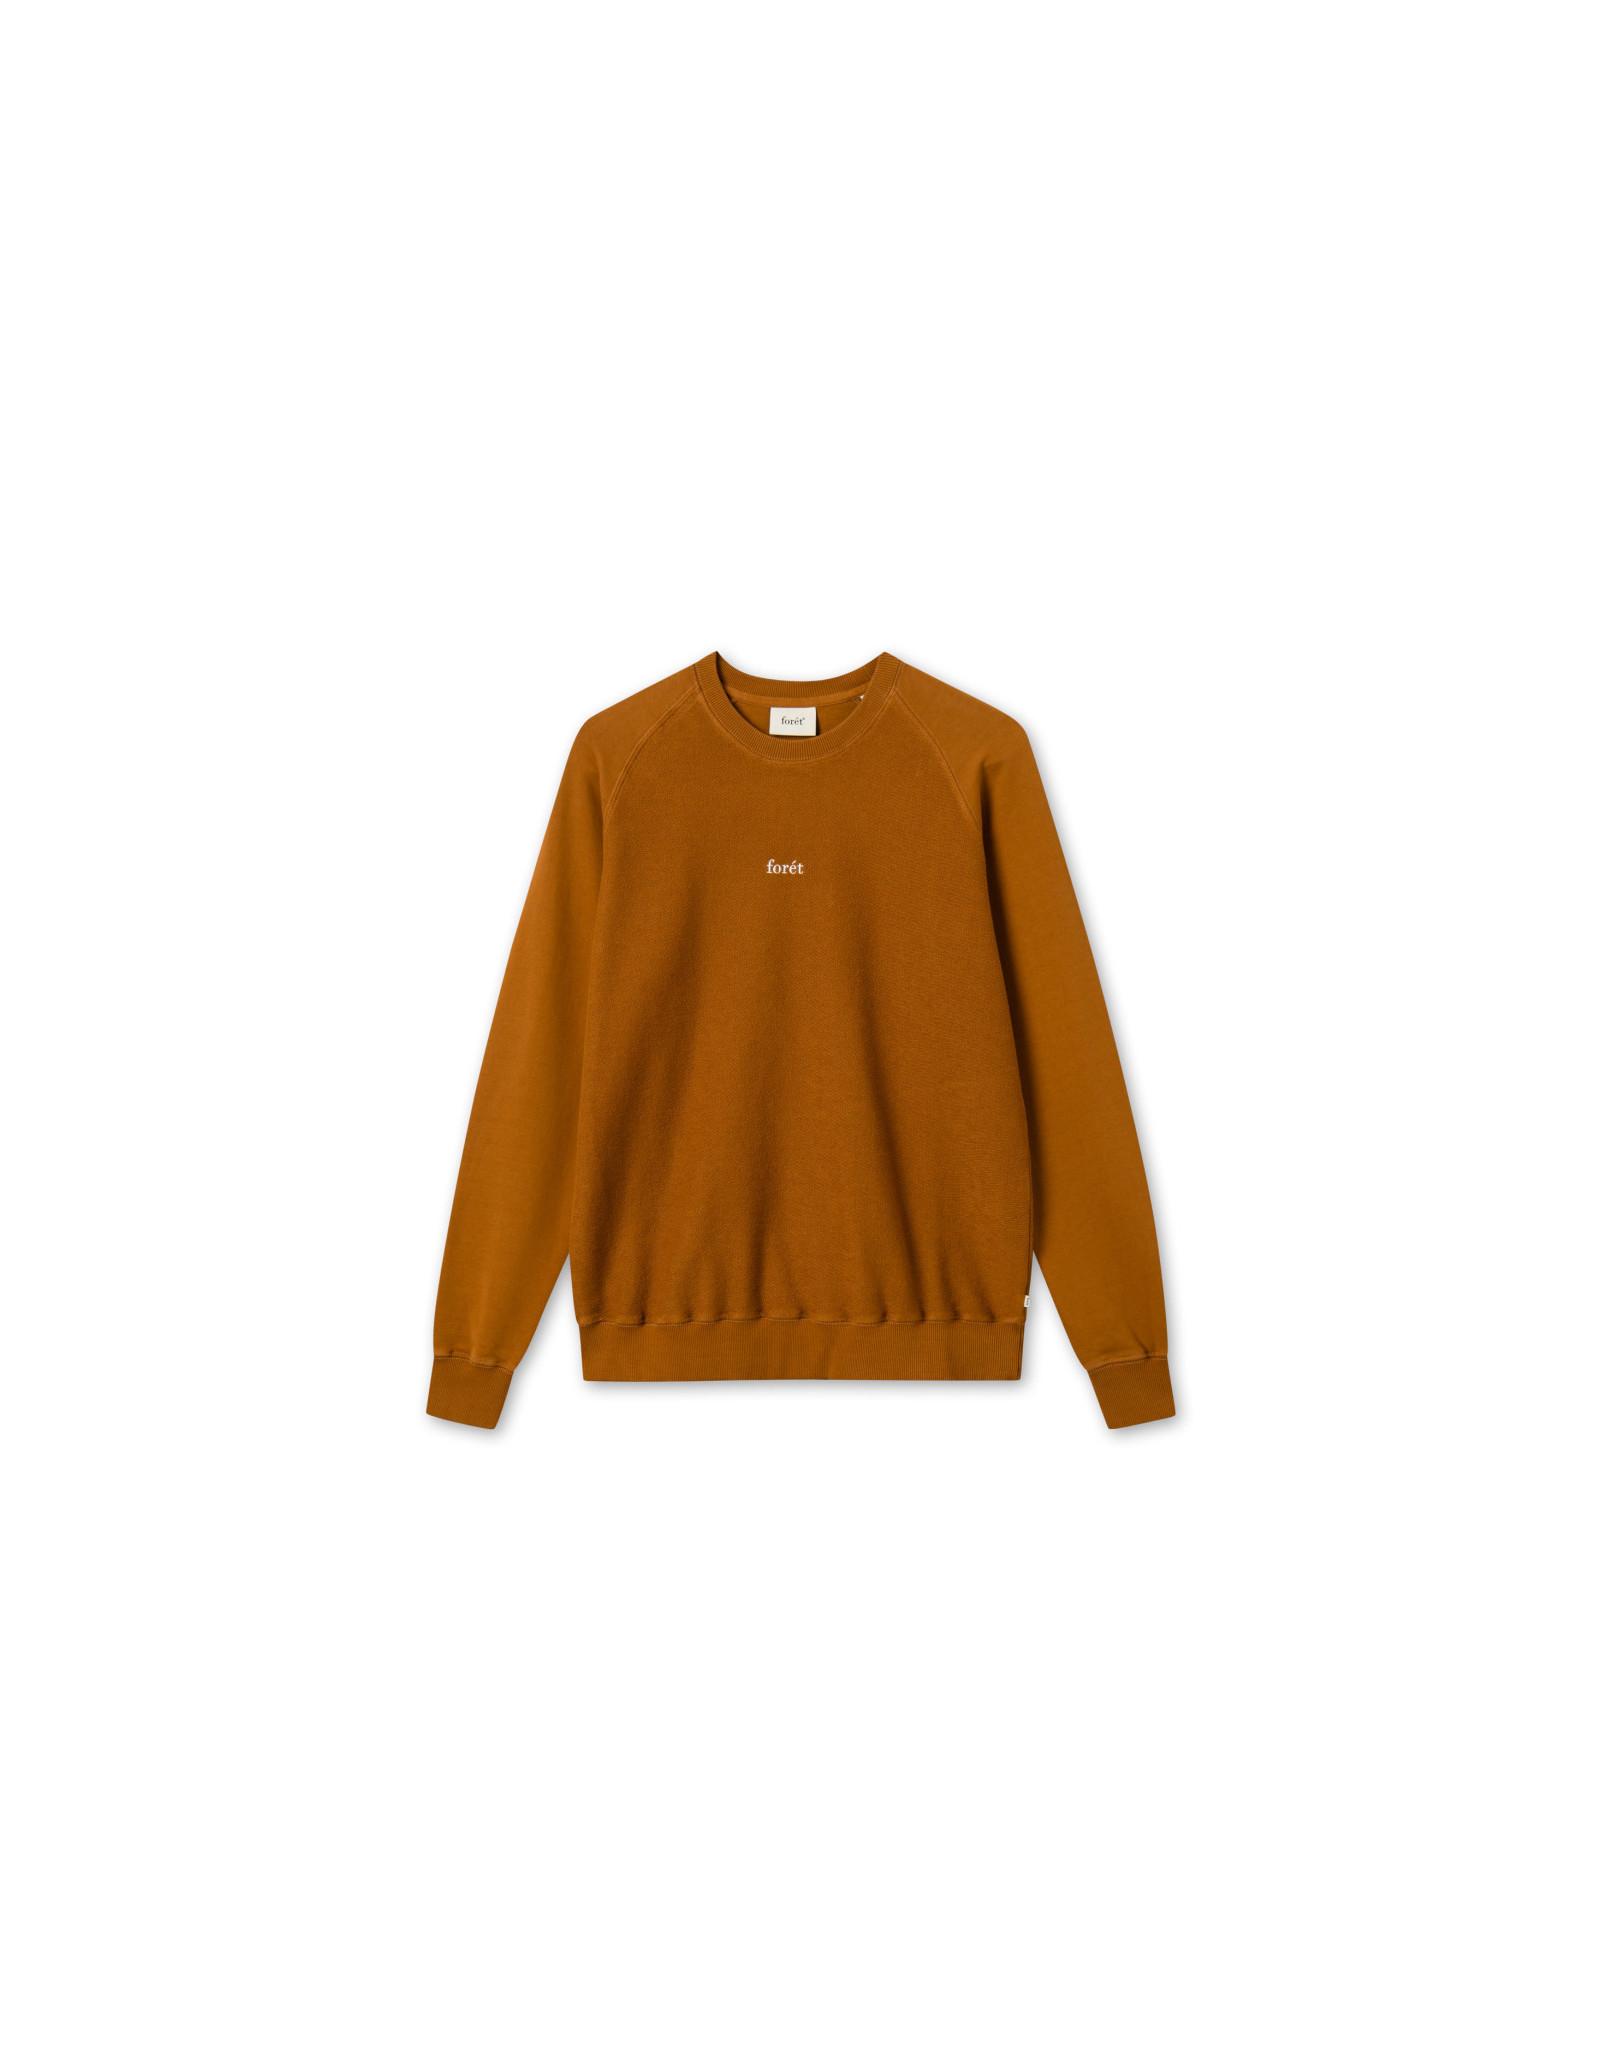 Forét West Sweatshirt